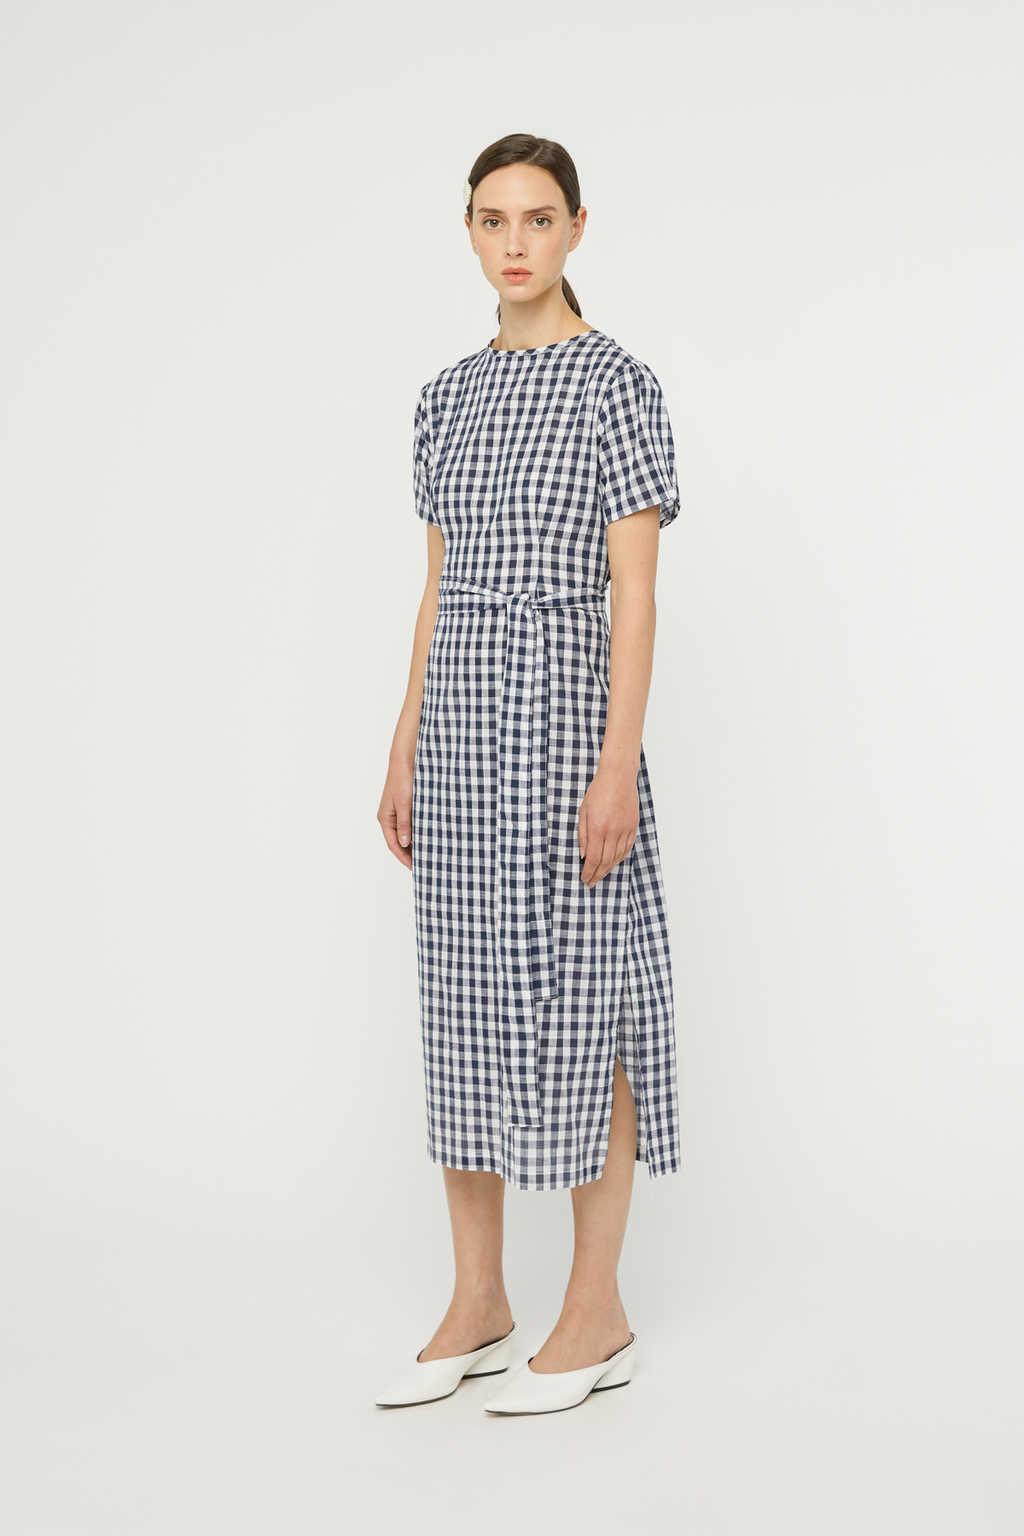 Dress K007 Navy 1